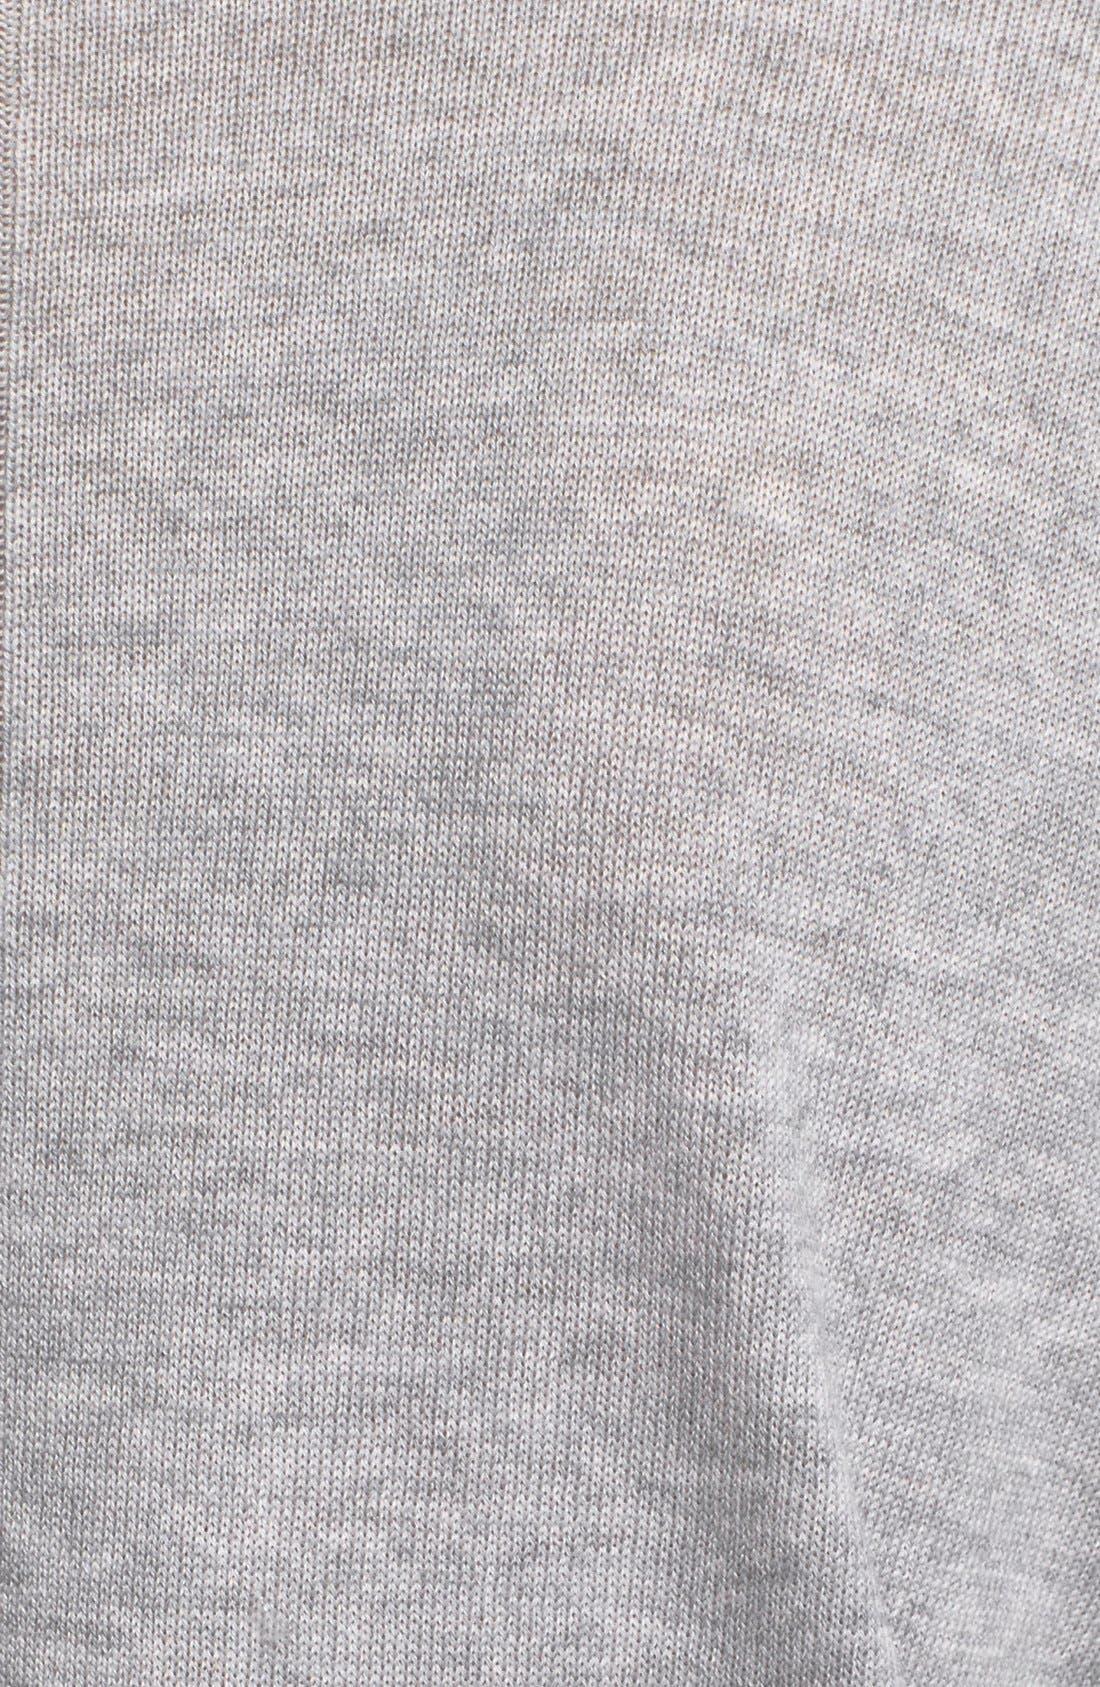 Alternate Image 3  - rag & bone 'Jessica' Merino Wool V-Neck Sweater